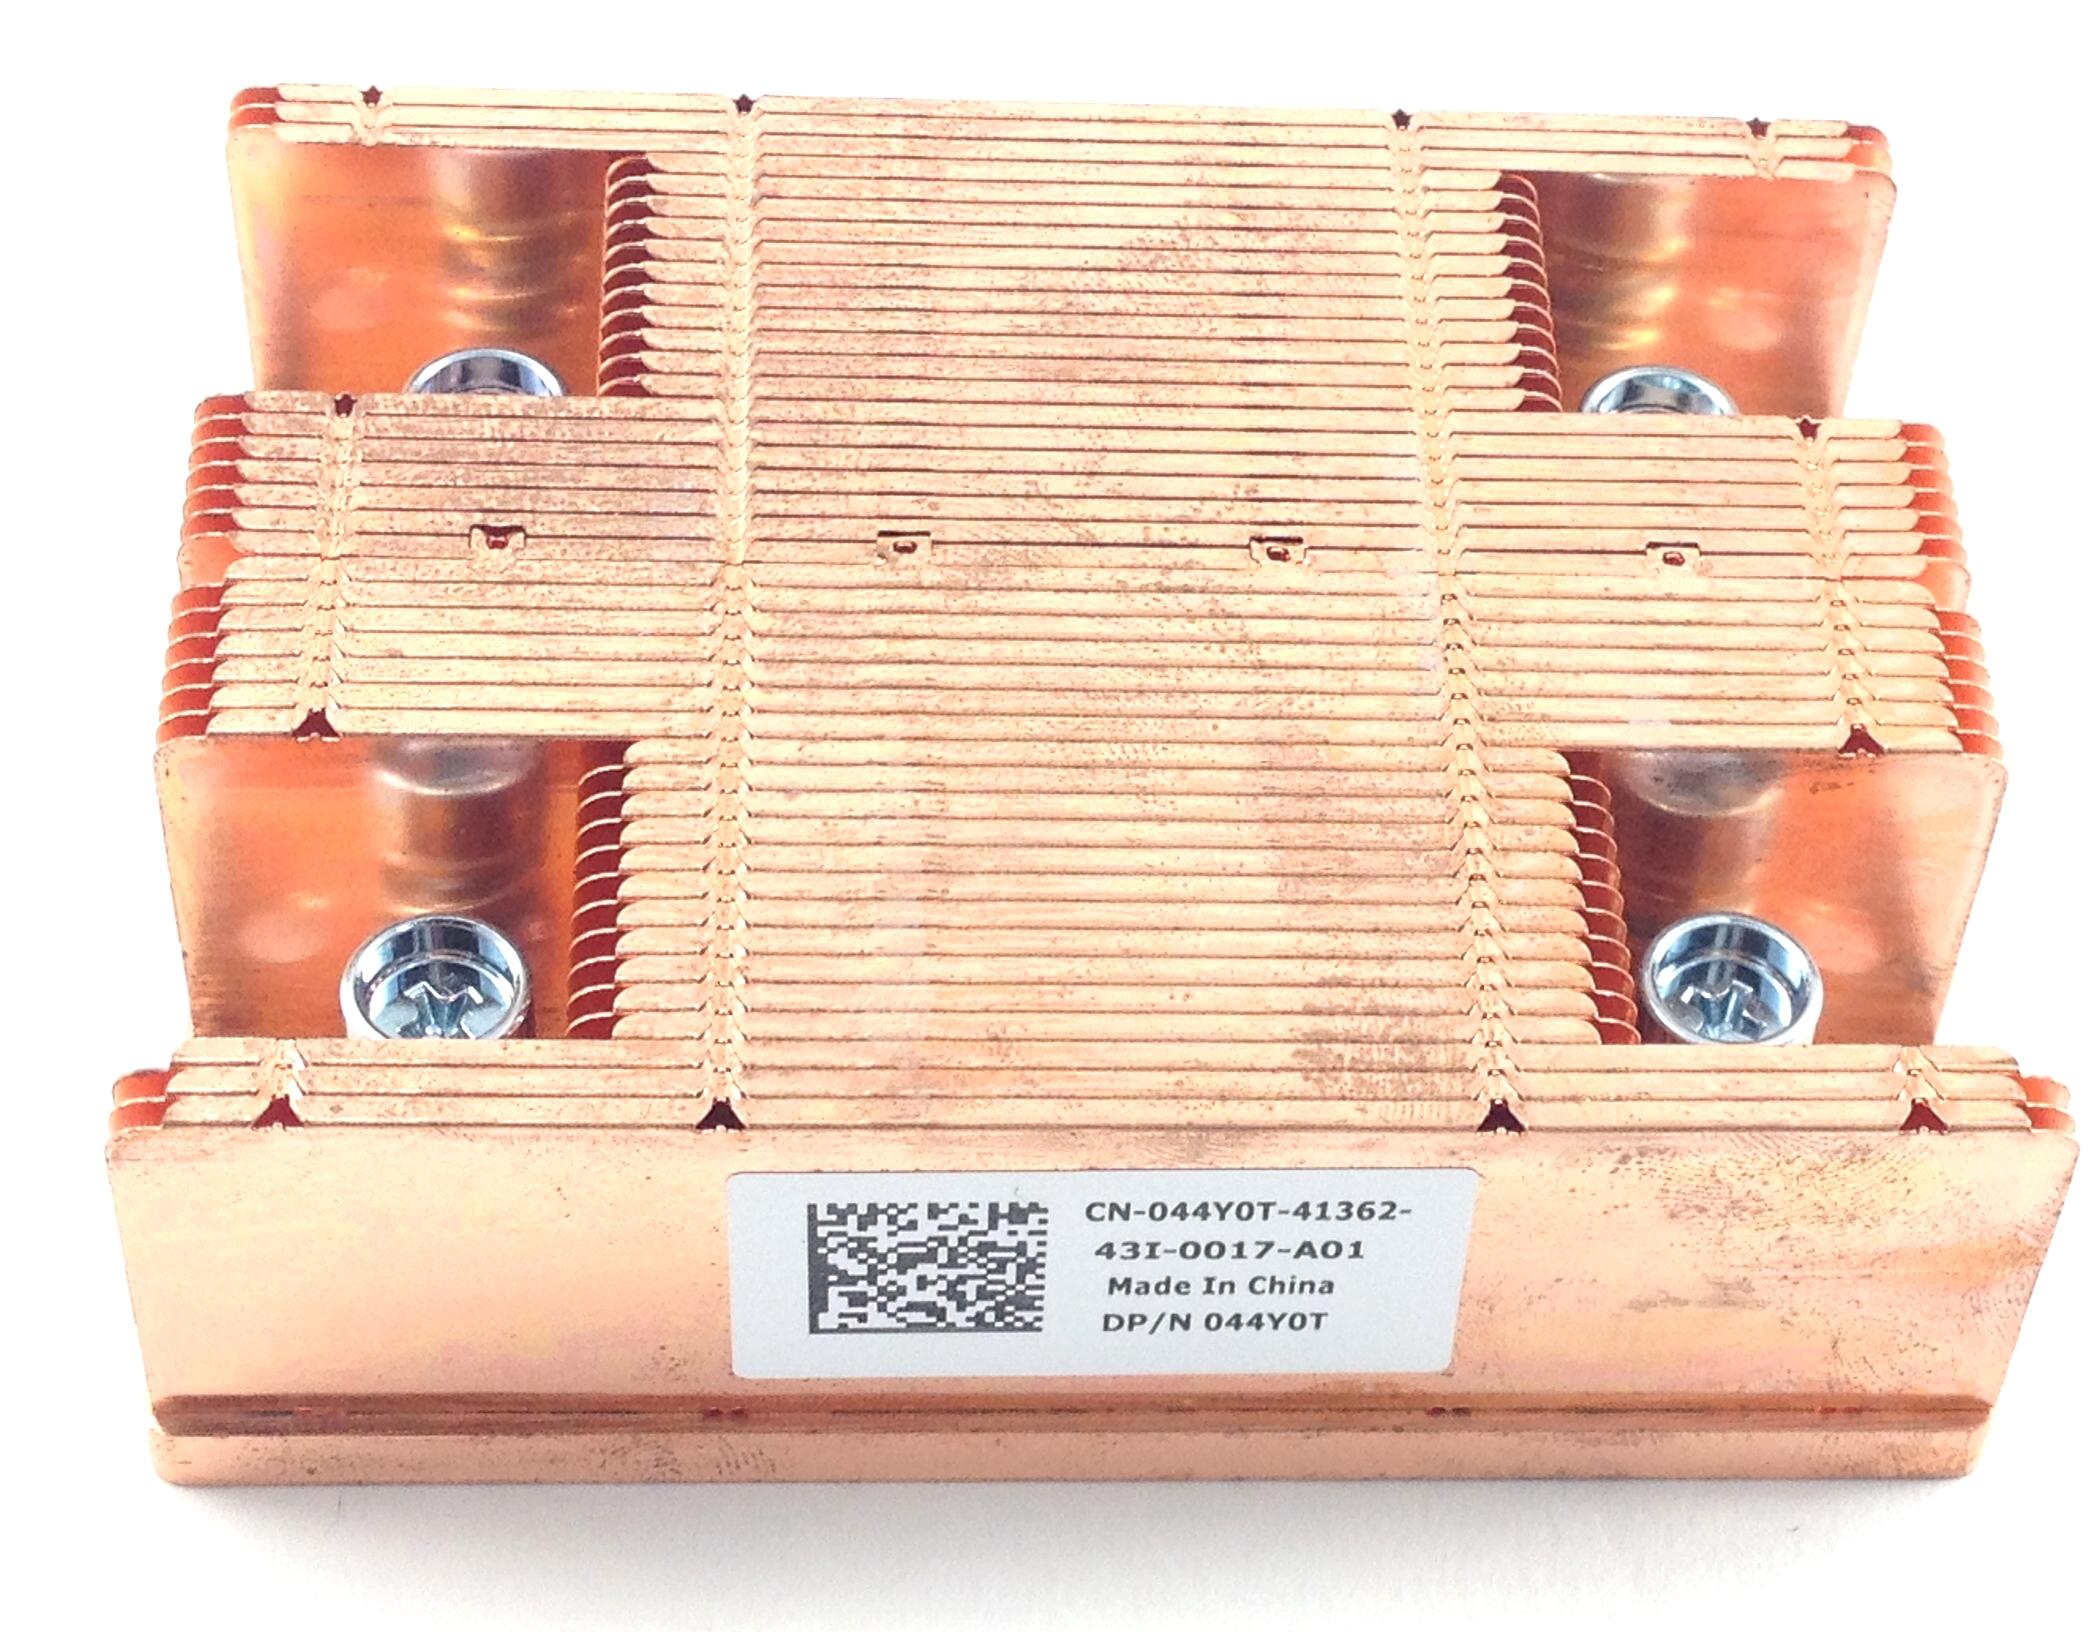 Dell PowerEdge M620 Blade Server Heatsink (44Y0T)